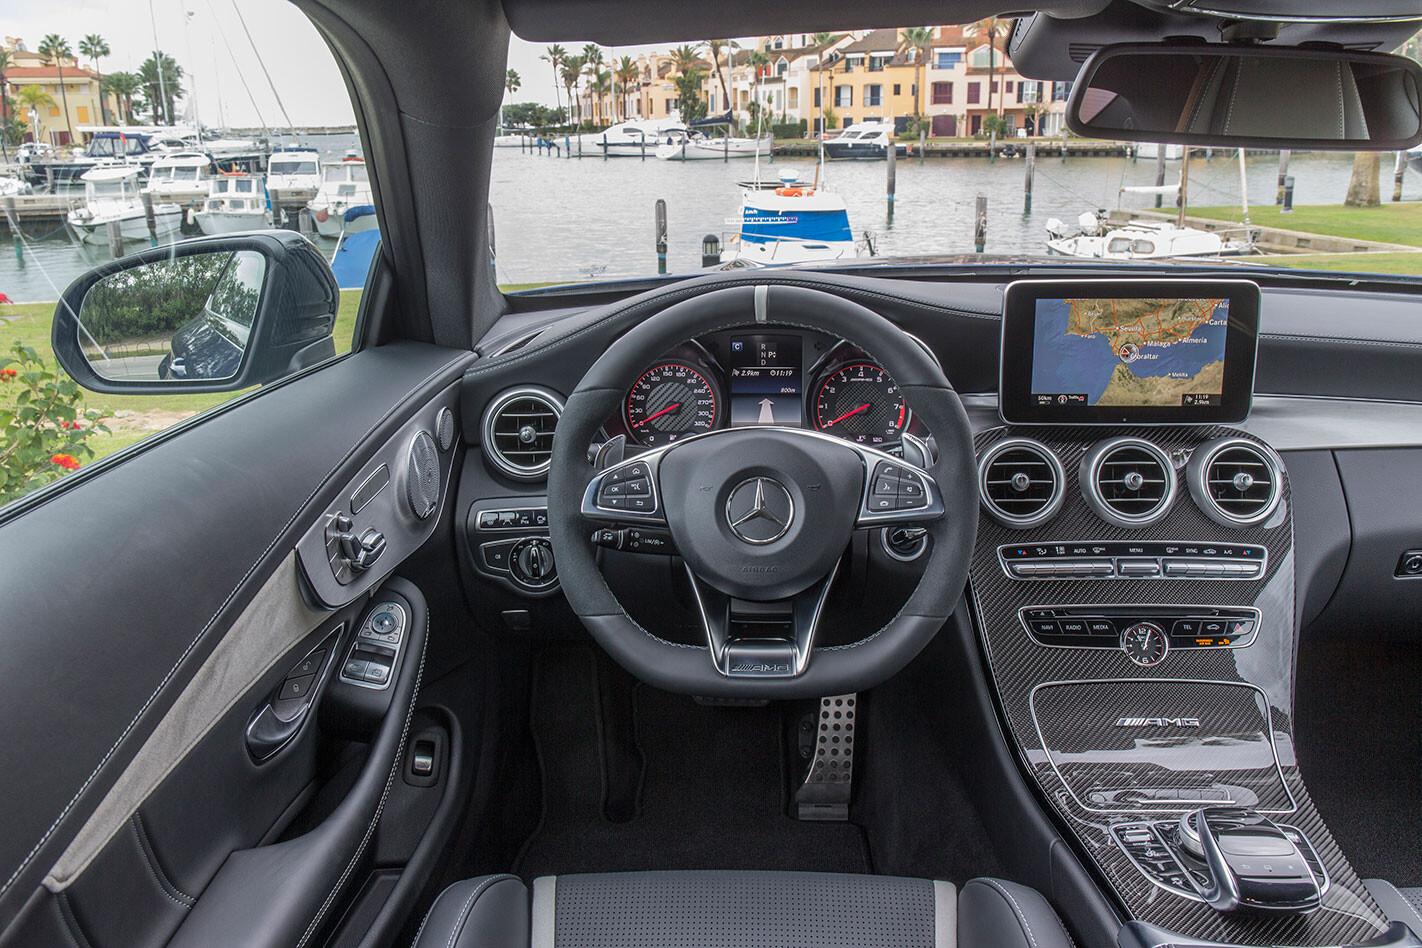 Mercedes -AMG-C63-S-Coupe -interior